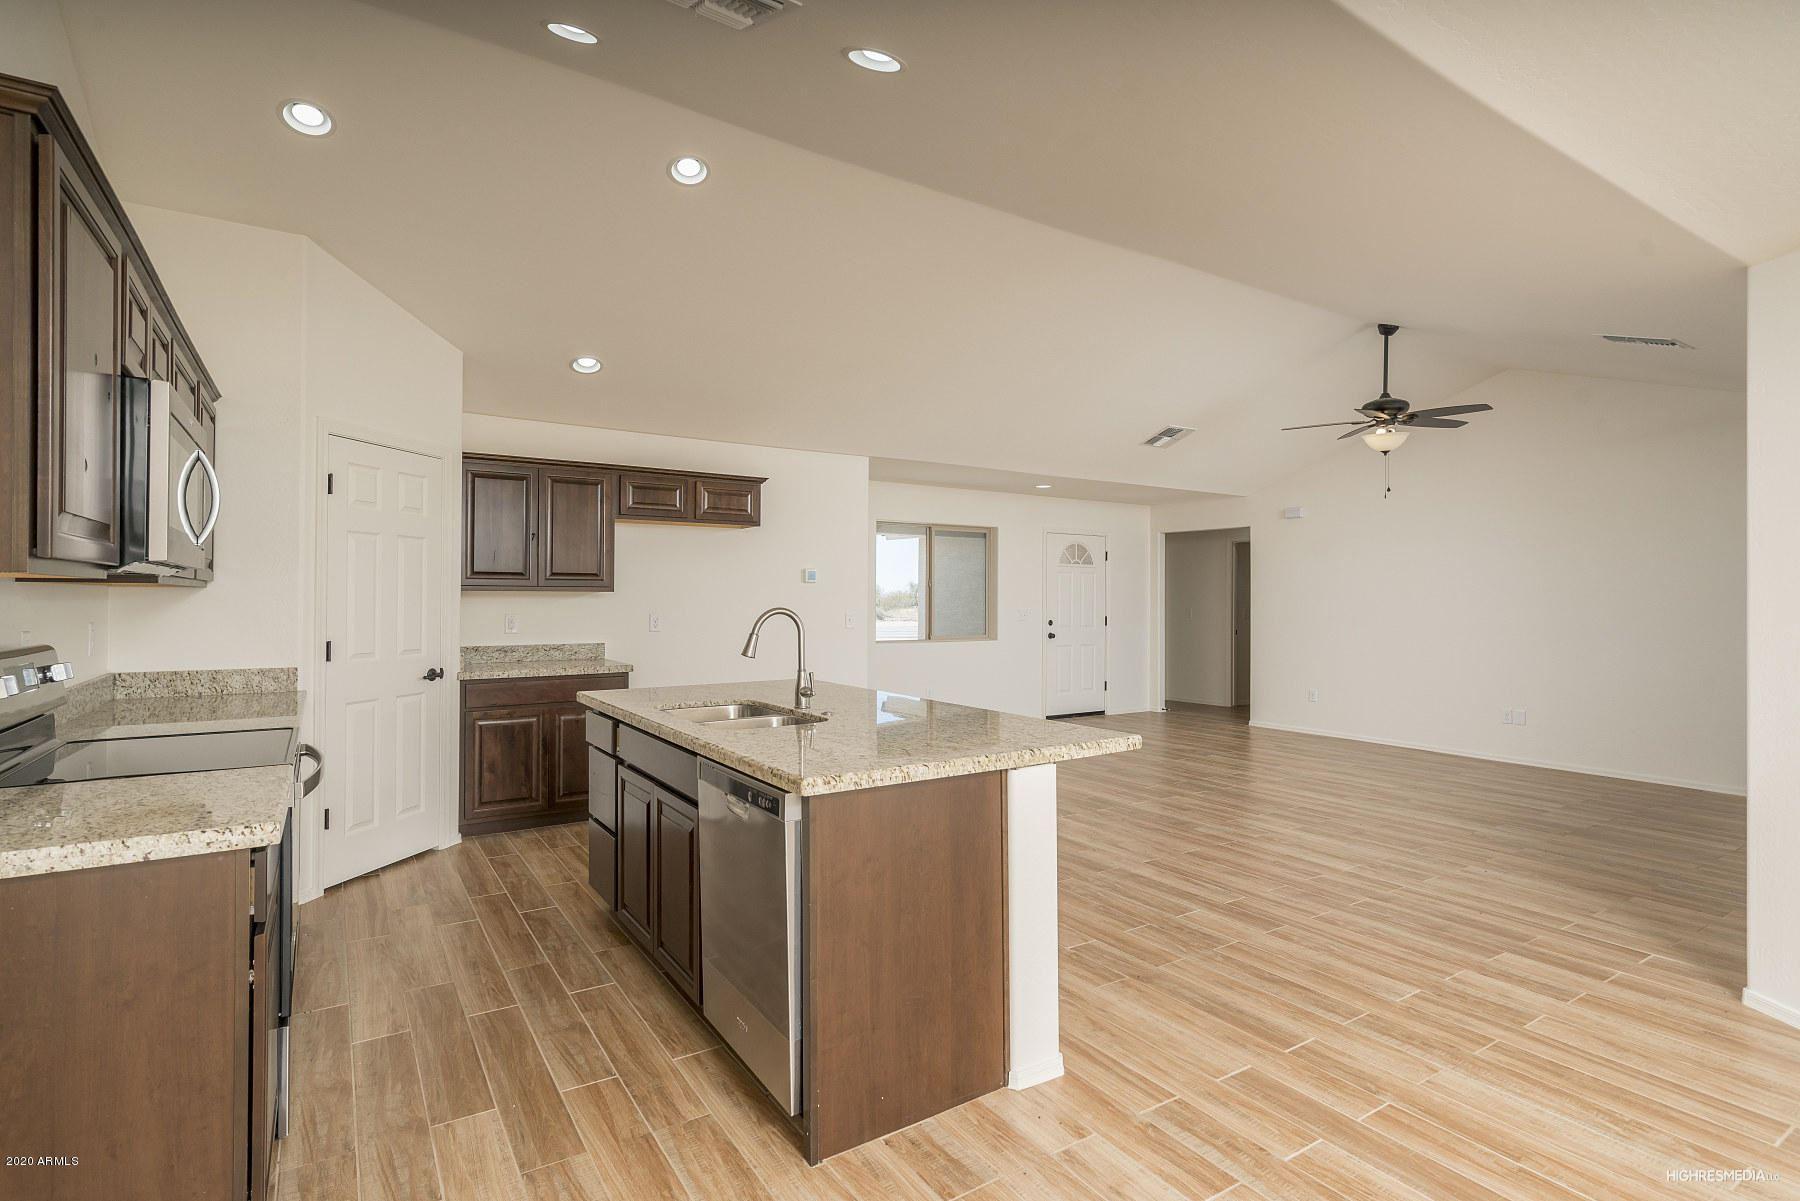 Photo of 22410 W LONE MOUNTAIN Road, Wittmann, AZ 85361 (MLS # 6231815)